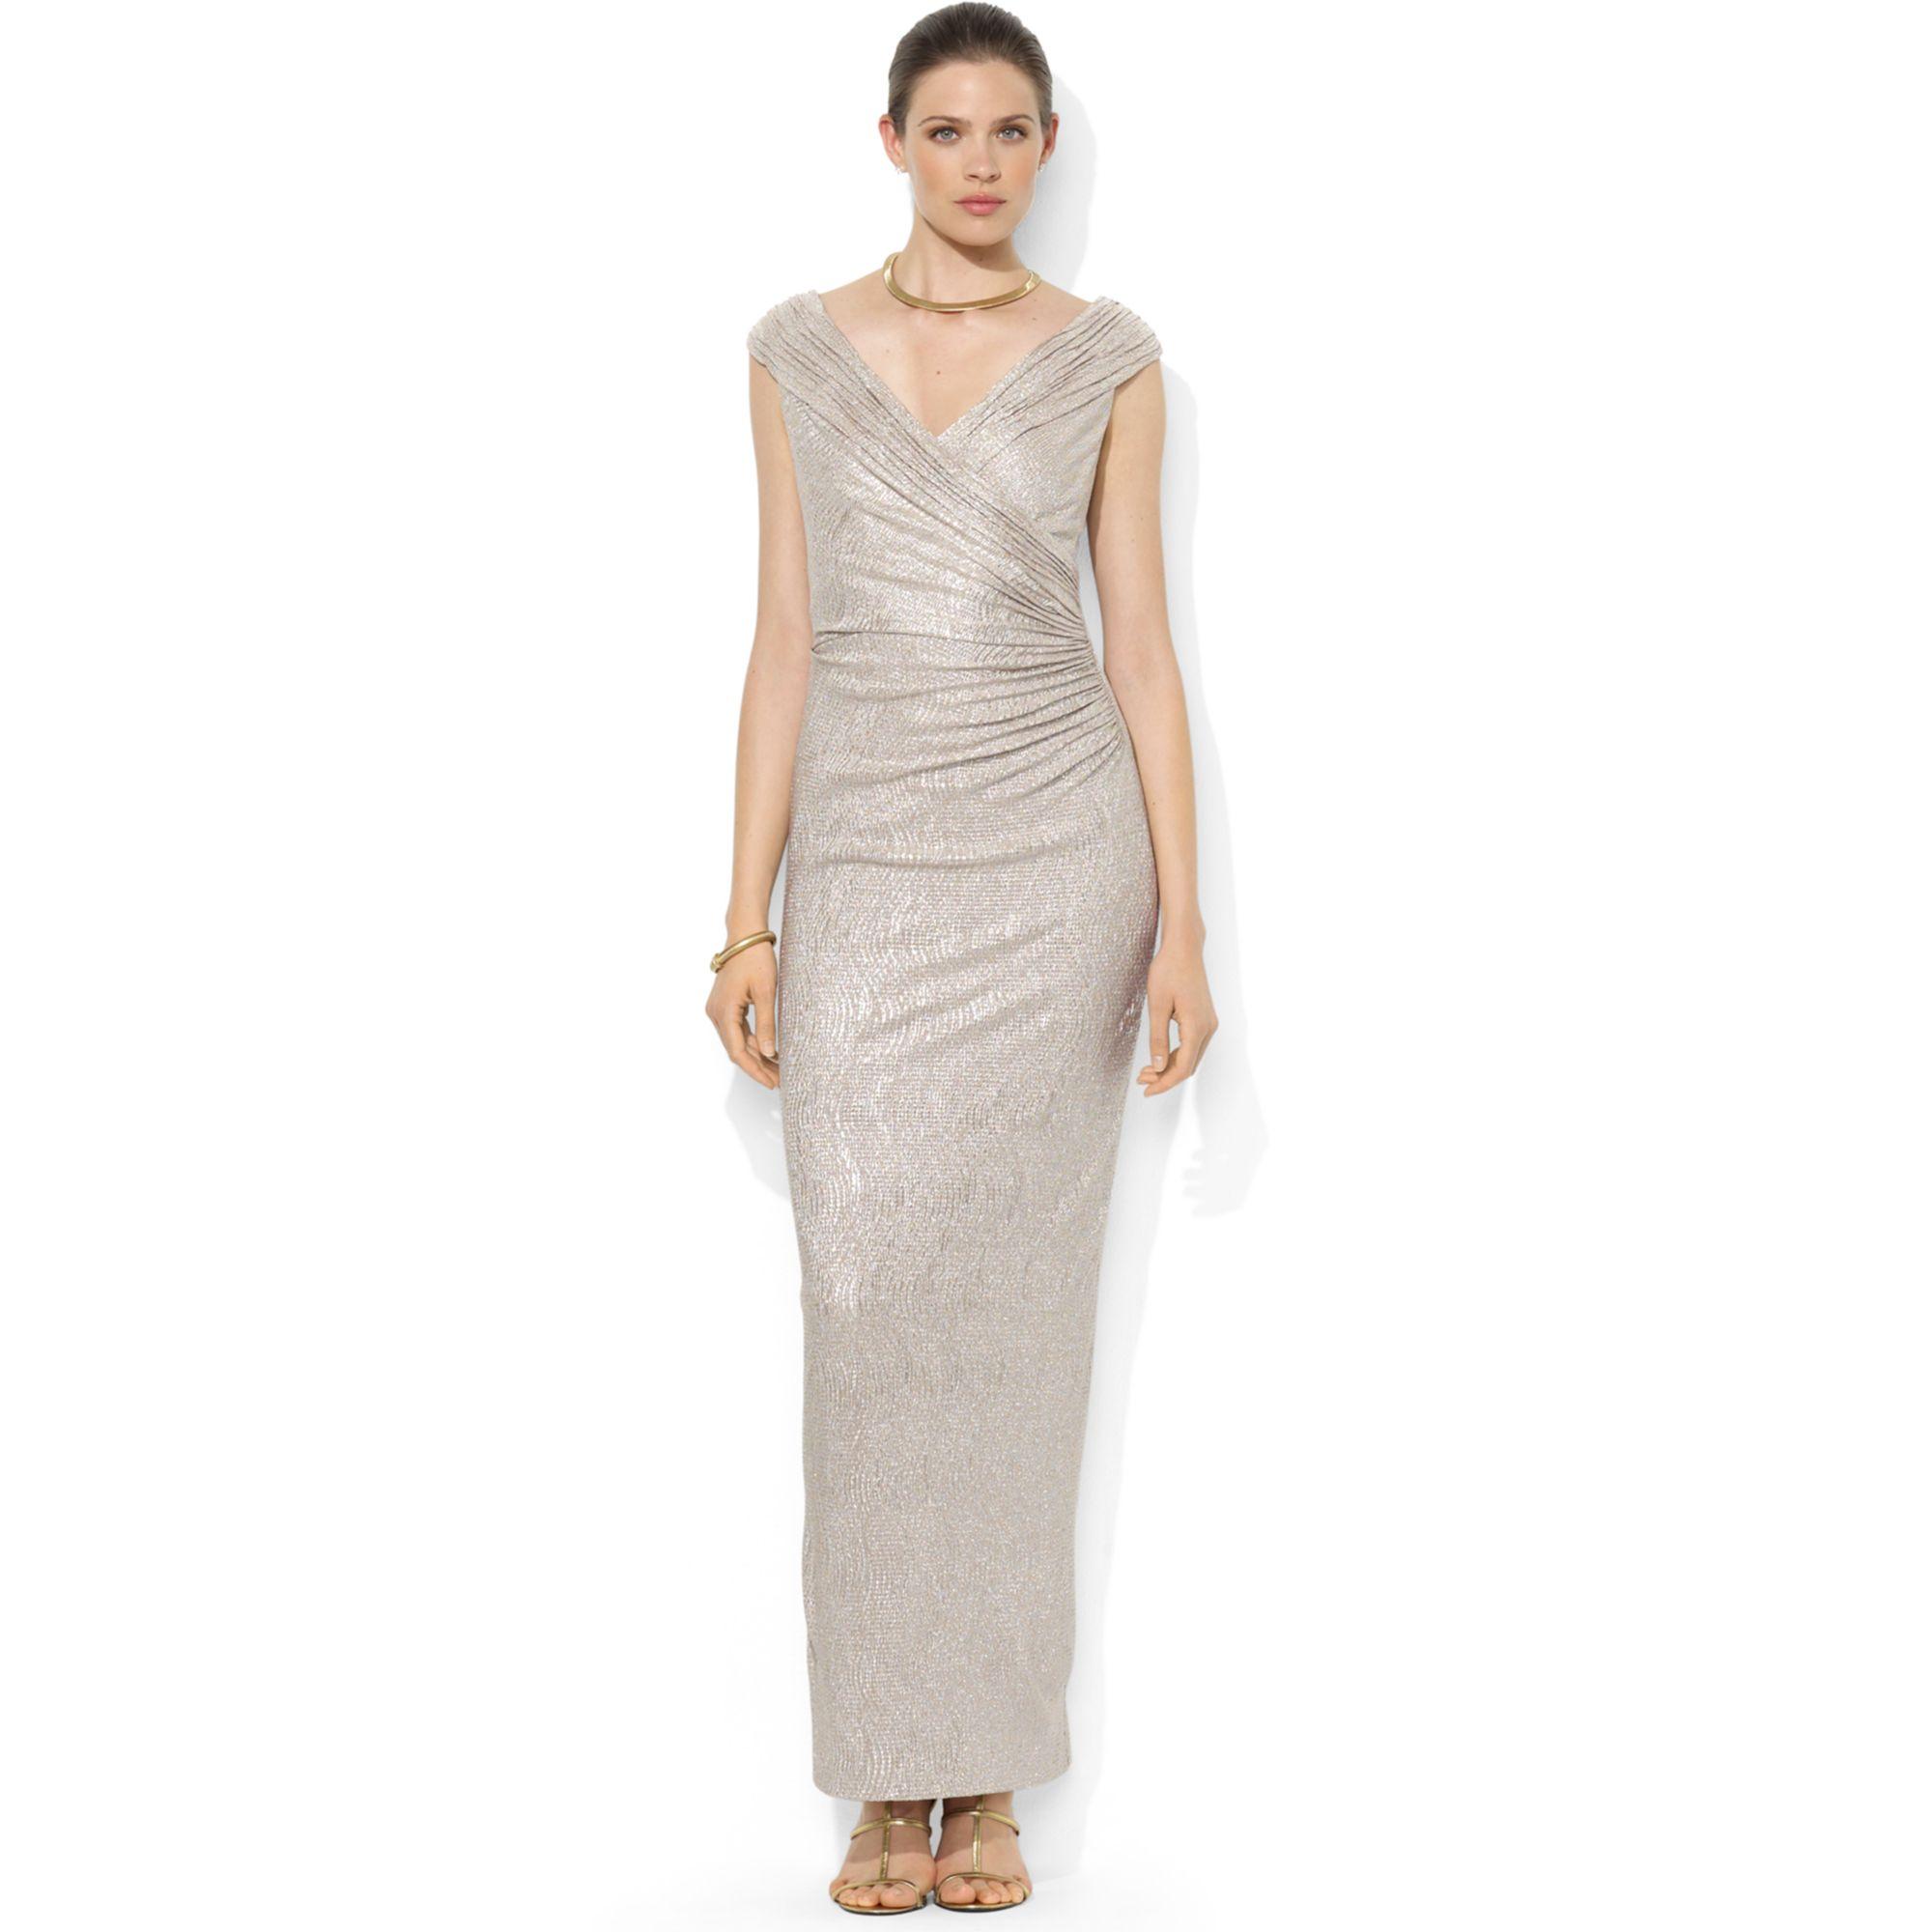 4d041b8c9883b Lyst - Lauren by Ralph Lauren Sleeveless Metallic Ruched Gown in ...